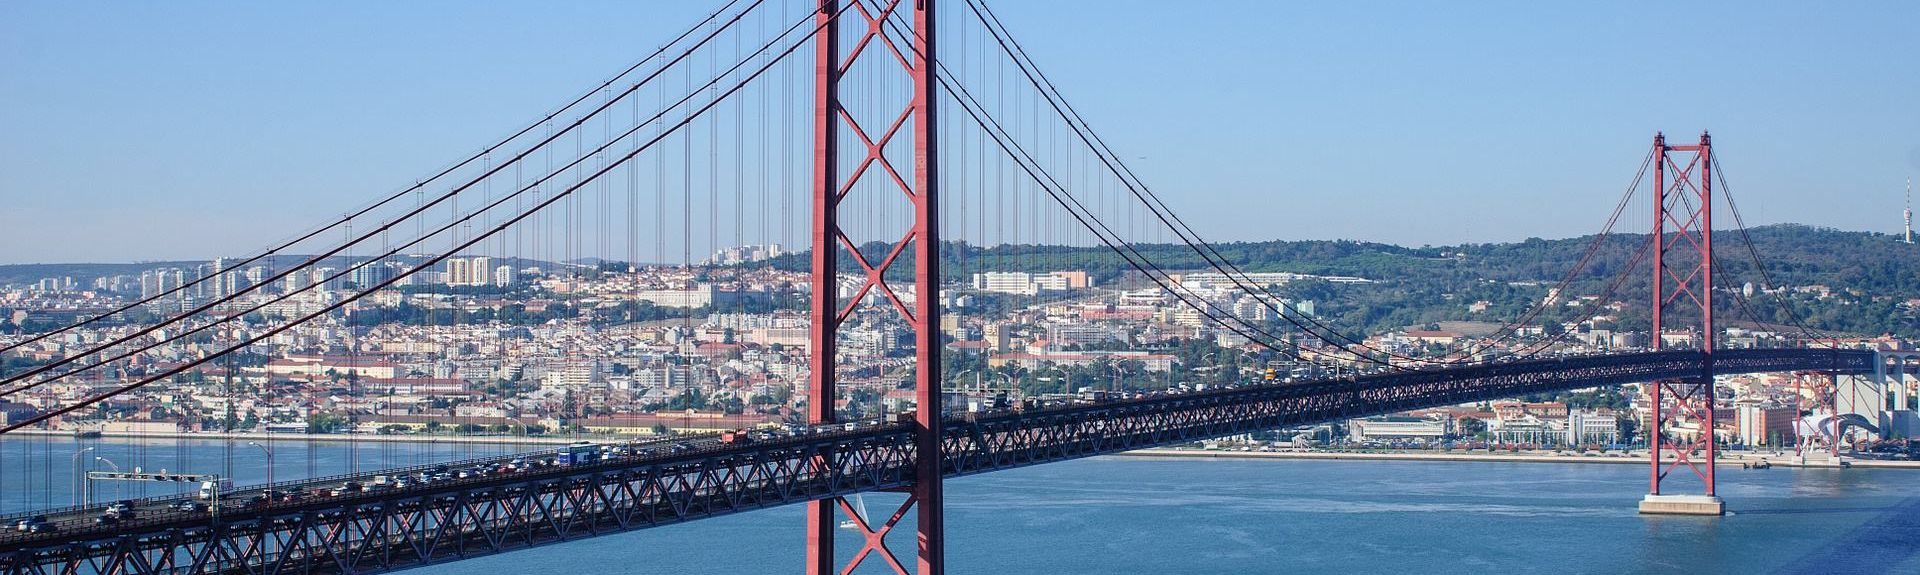 Anjos, Lisbon, Lisbon District, Portugal